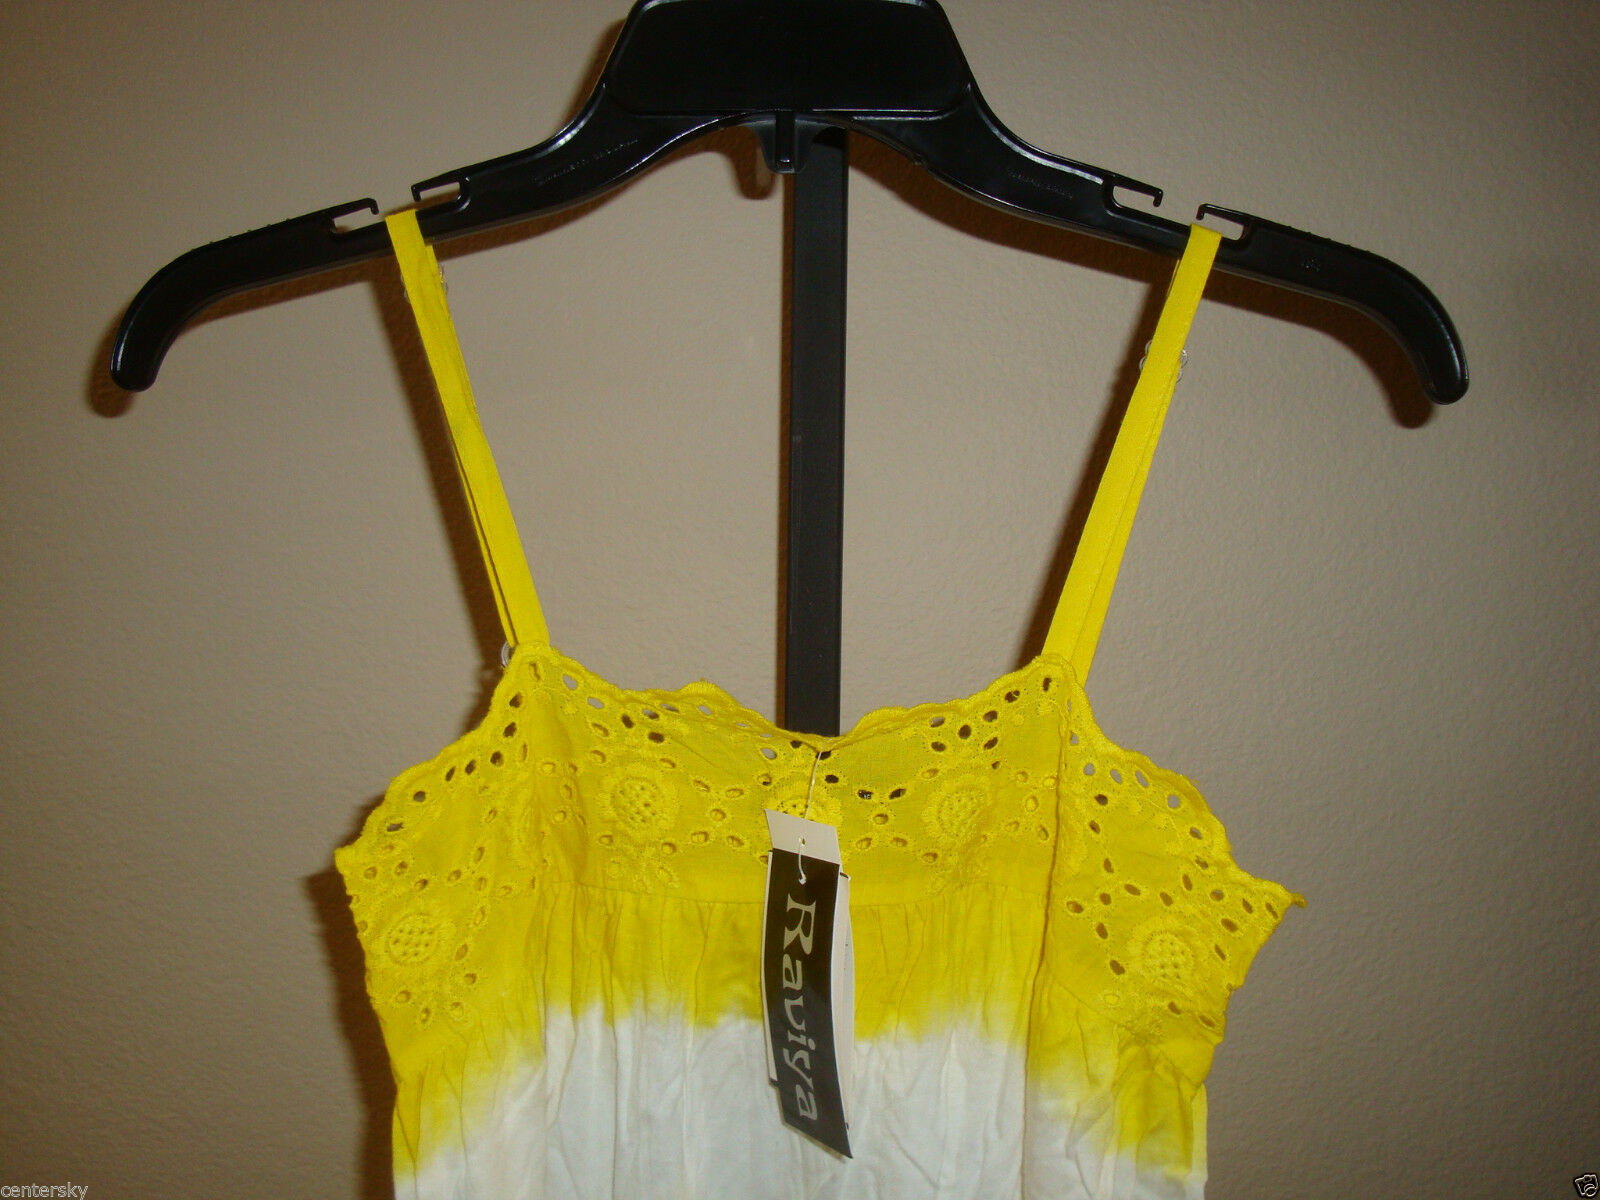 New $39 Raviya Women's Swimsuit Cover-up Lounge Beach Dress Yellow Wht Tie Dye S image 3